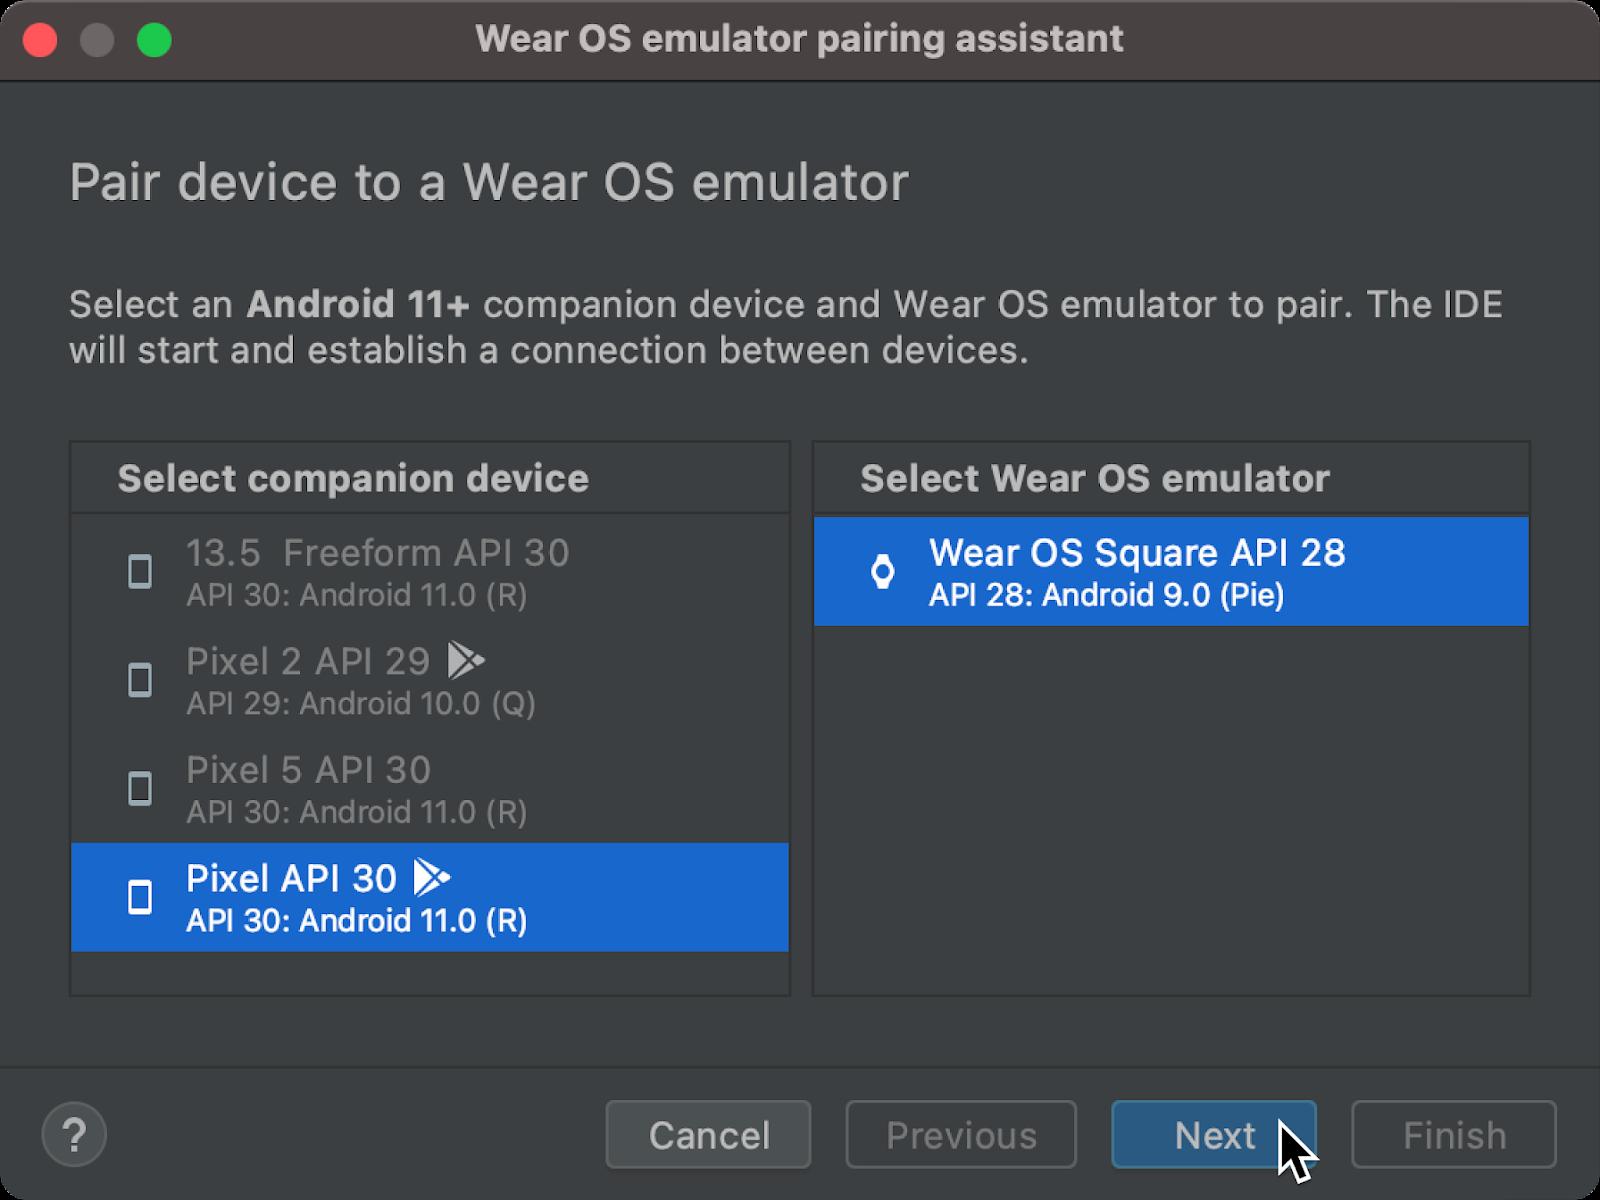 Wear OS emulator pairing assistant dialog